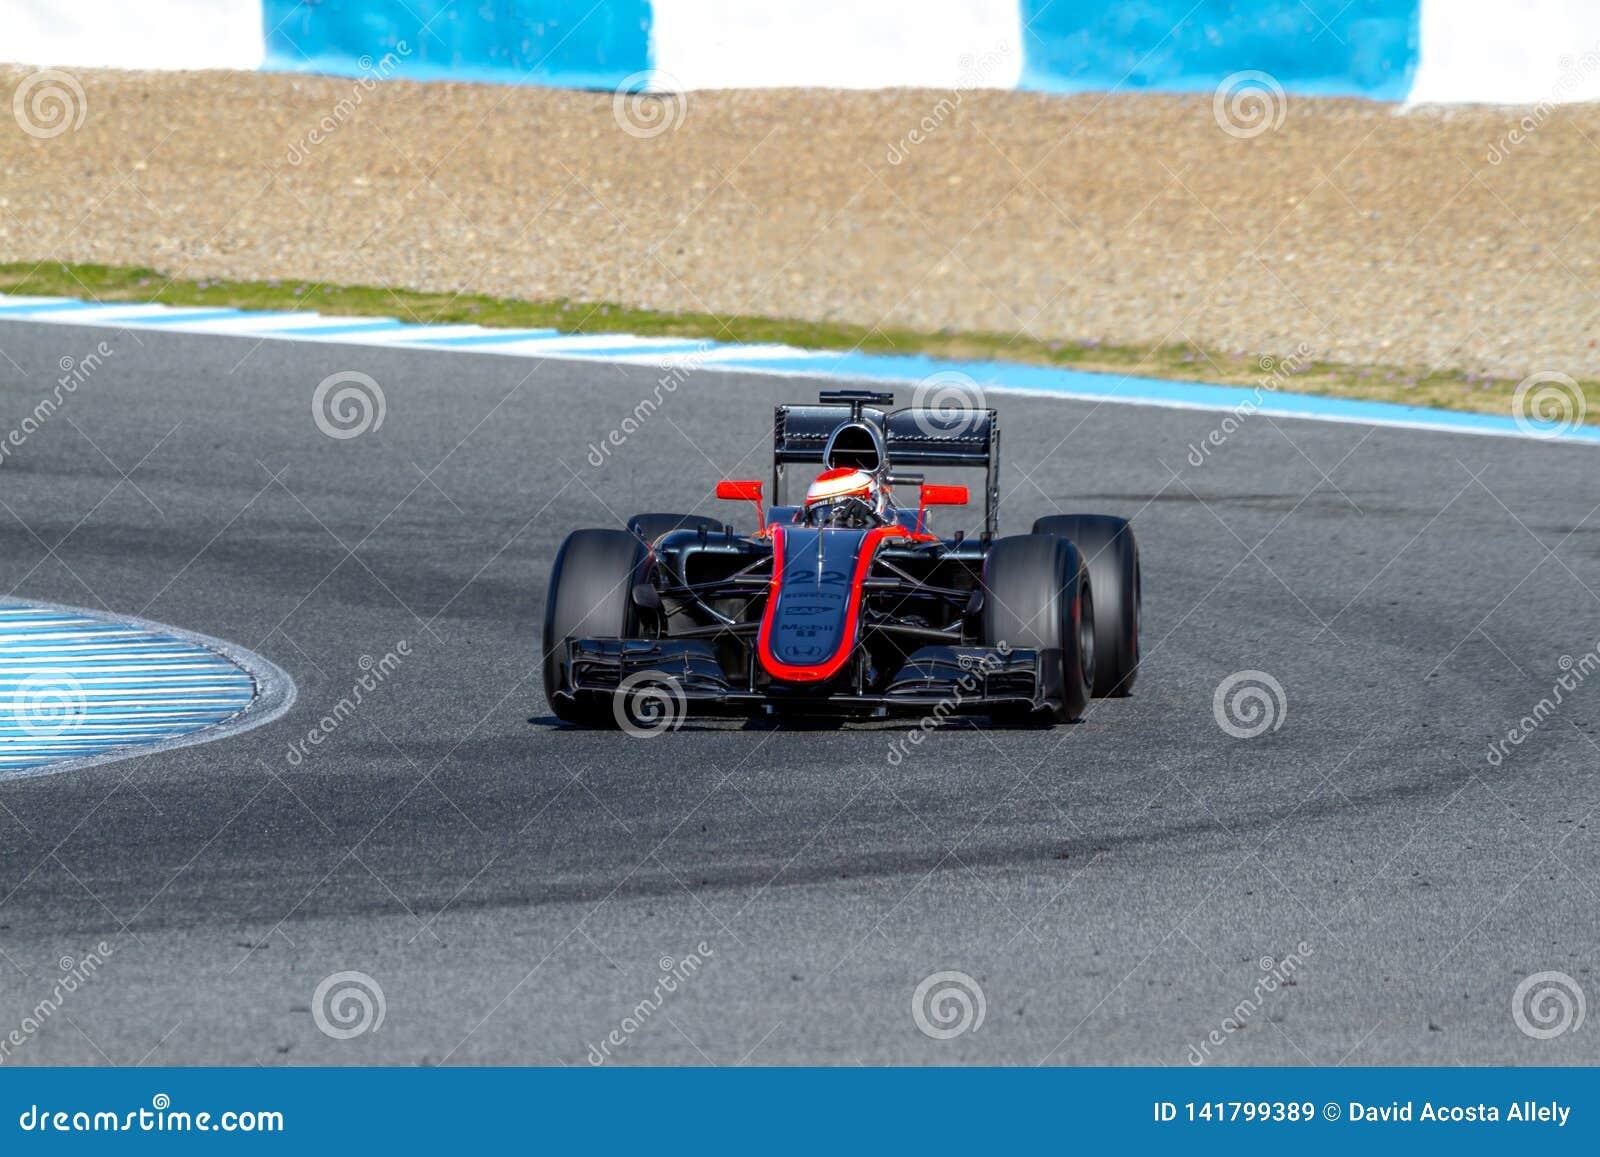 Team McLaren Honda F1, Jenson Button, 2015